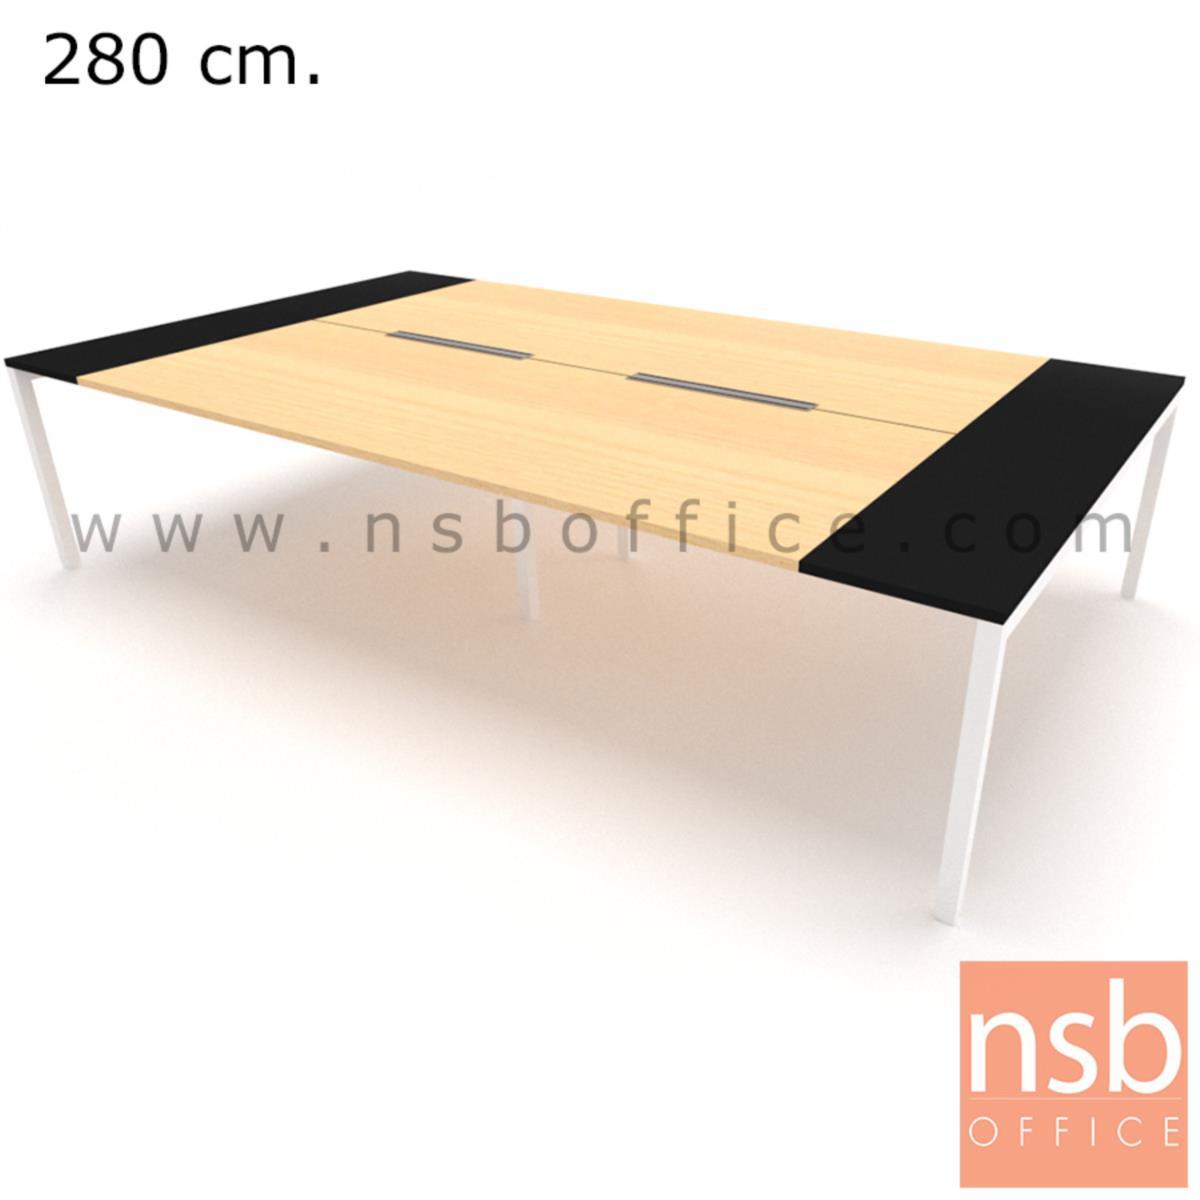 A05A177:โต๊ะประชุมทรงสี่เหลี่ยม 180D cm. NSB-SQ18  พร้อม popup แบบสองทาง